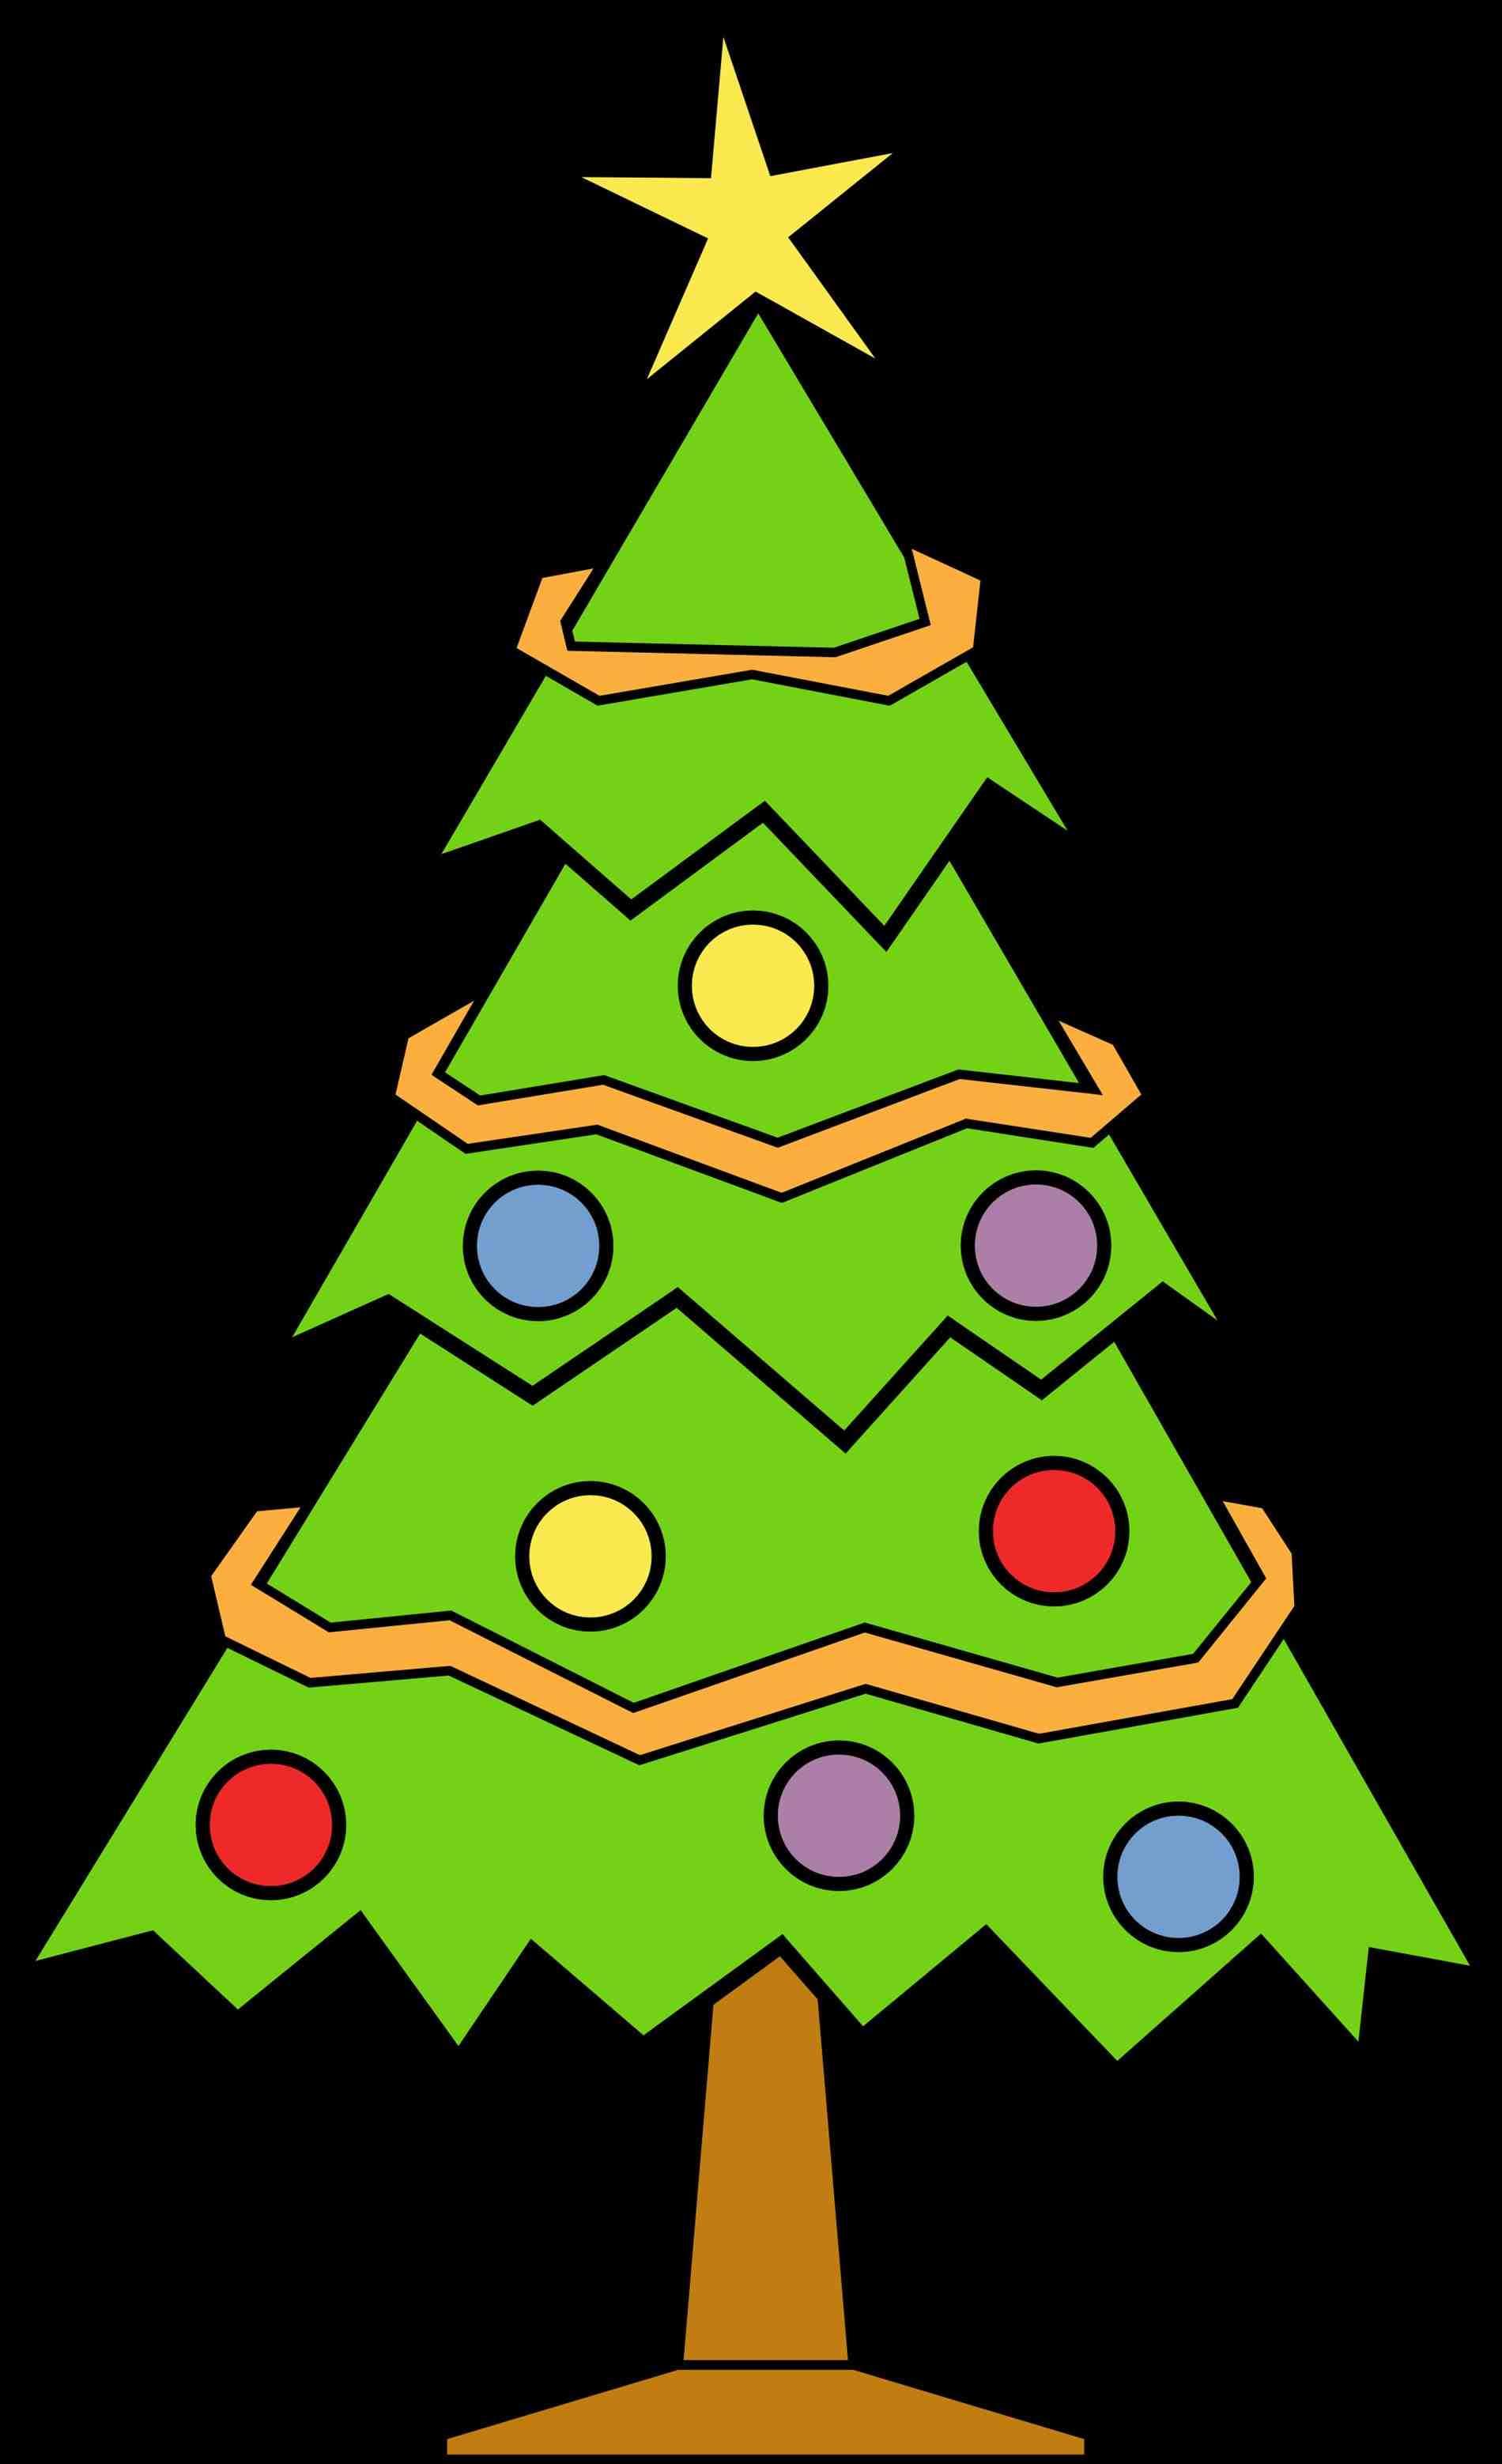 1900x3117 Abstract Christmas Tree Clip Art Free Cheminee.website